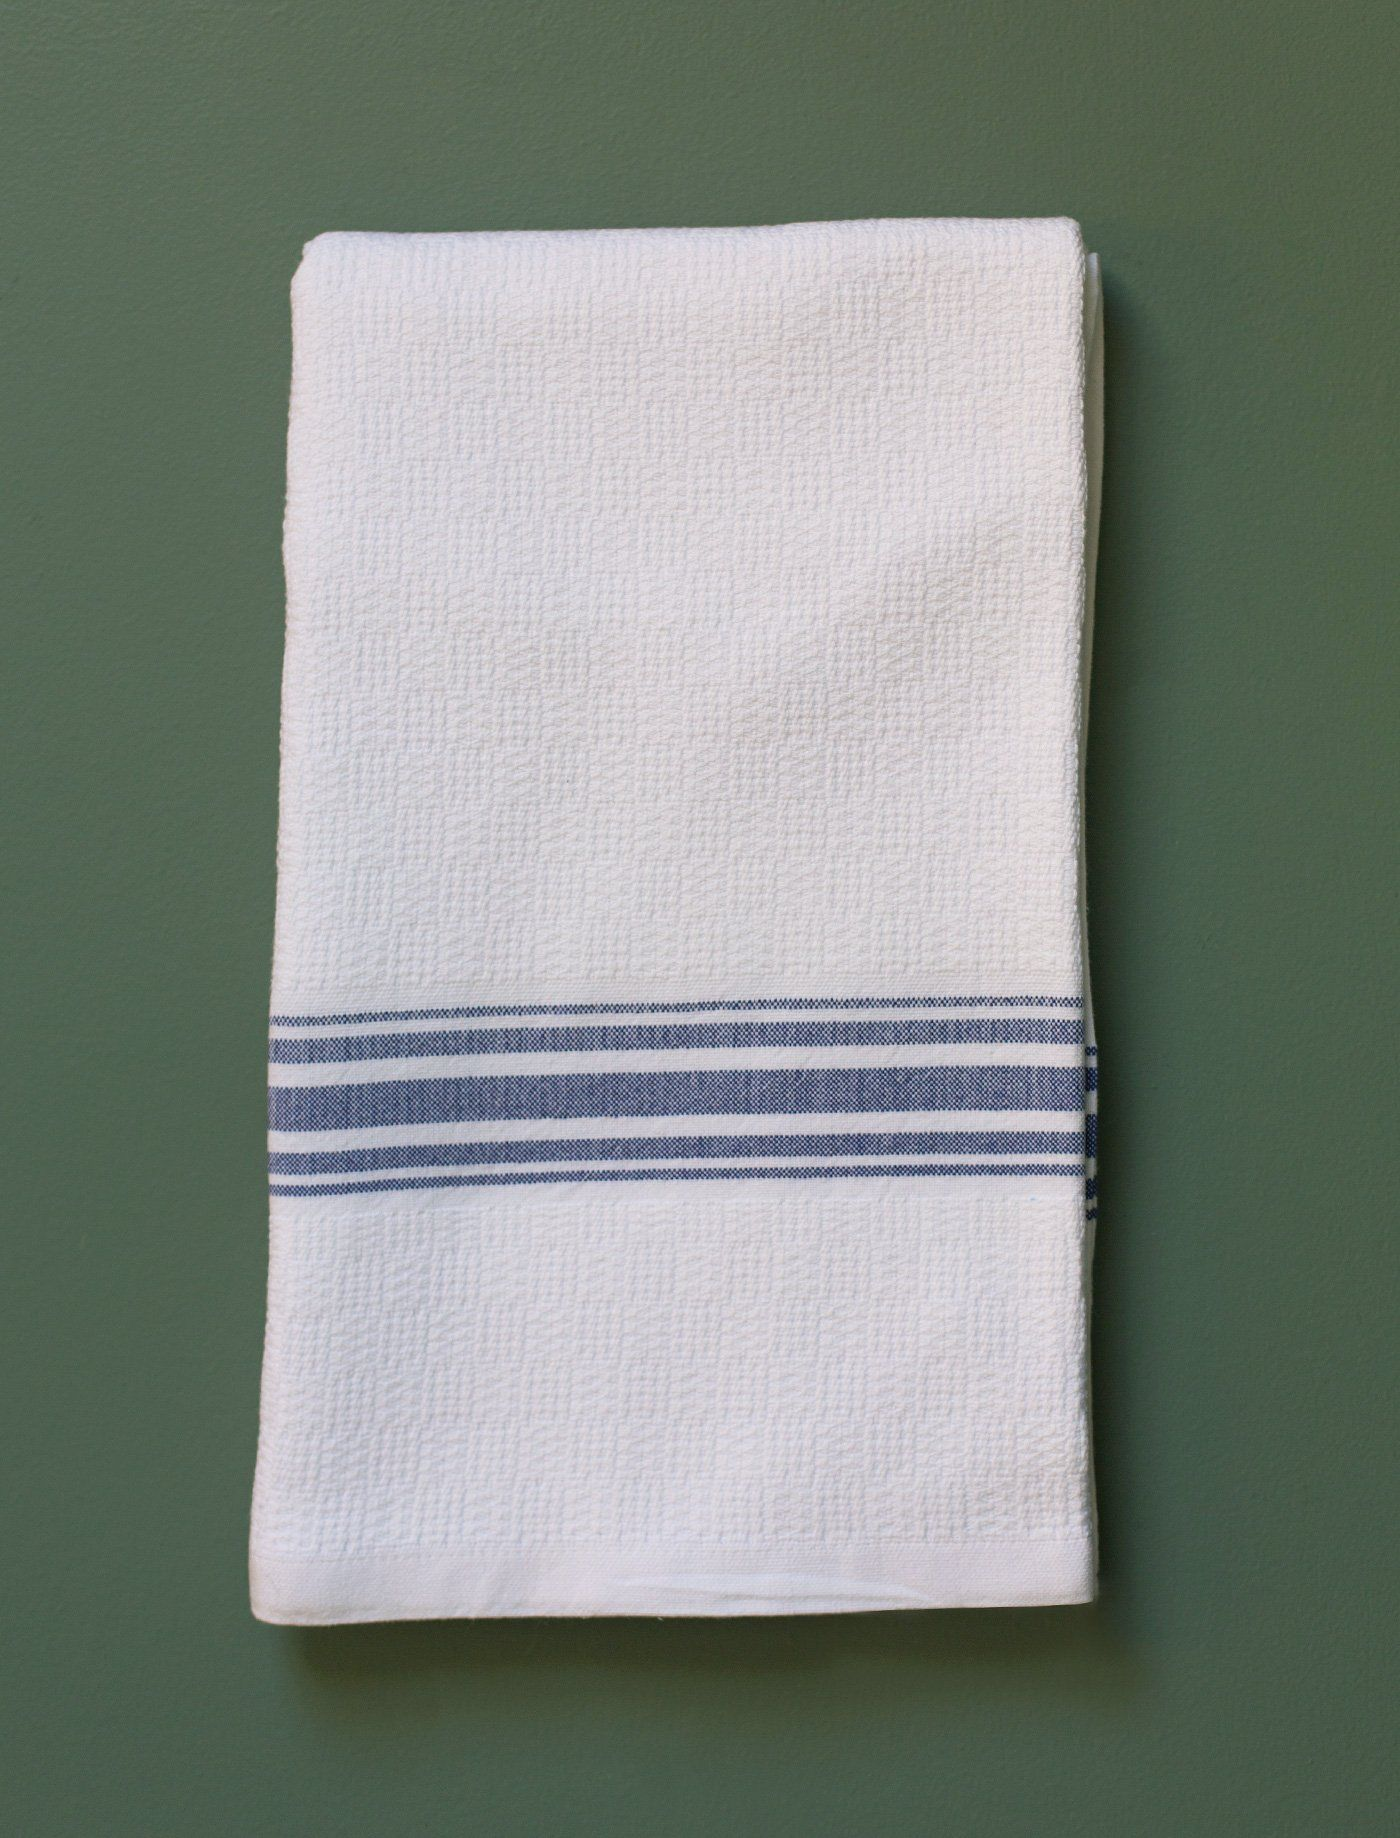 Willow Weave Bath Towel Everyday Needs Bath Towels Towel